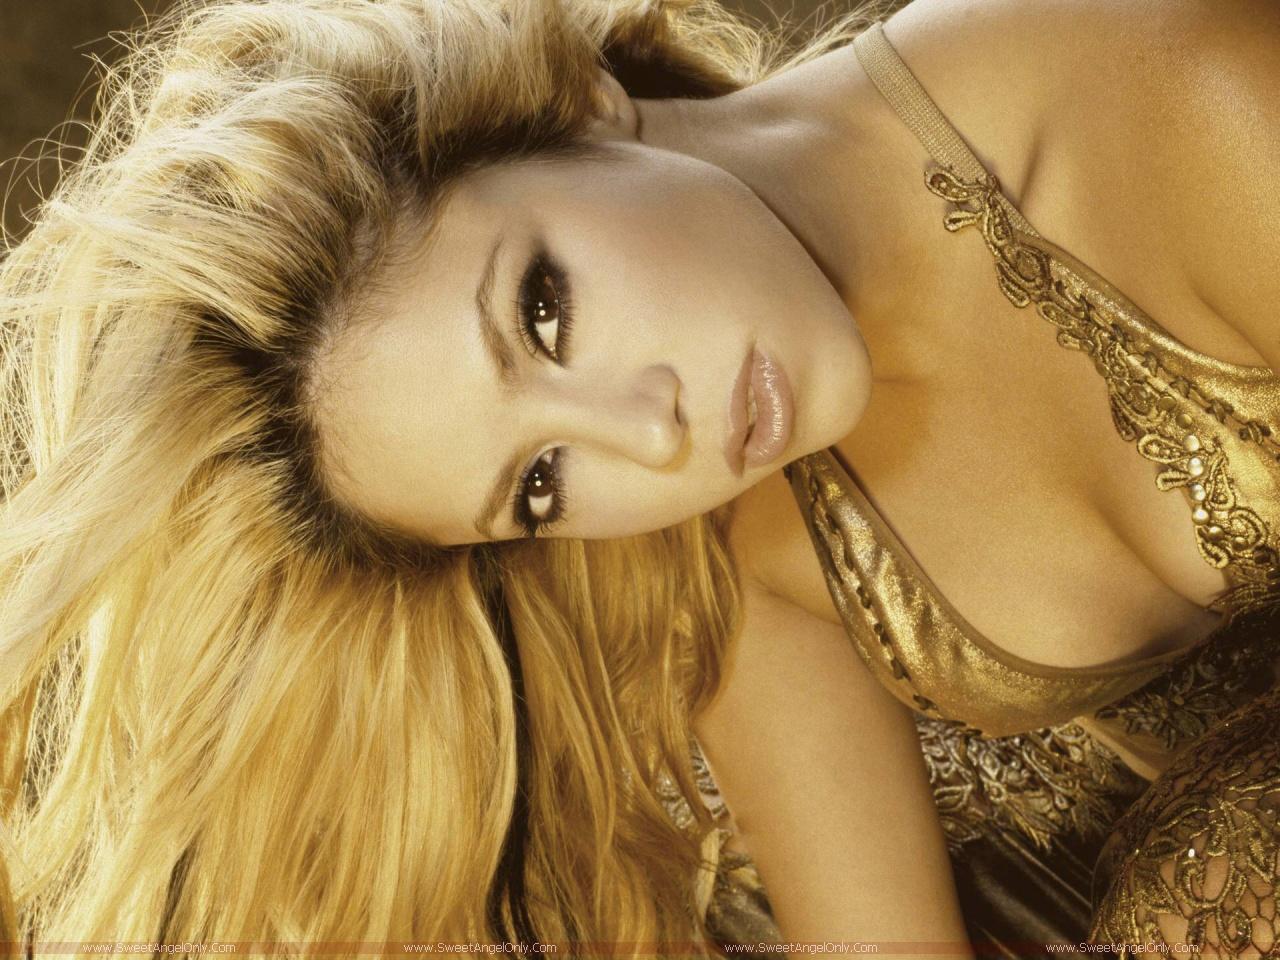 http://2.bp.blogspot.com/-CuoGm8zY4z8/TmCWOqhRuTI/AAAAAAAAKHY/WagJa-9lx68/s1600/Shakira_full_wide_wallpaper.jpg